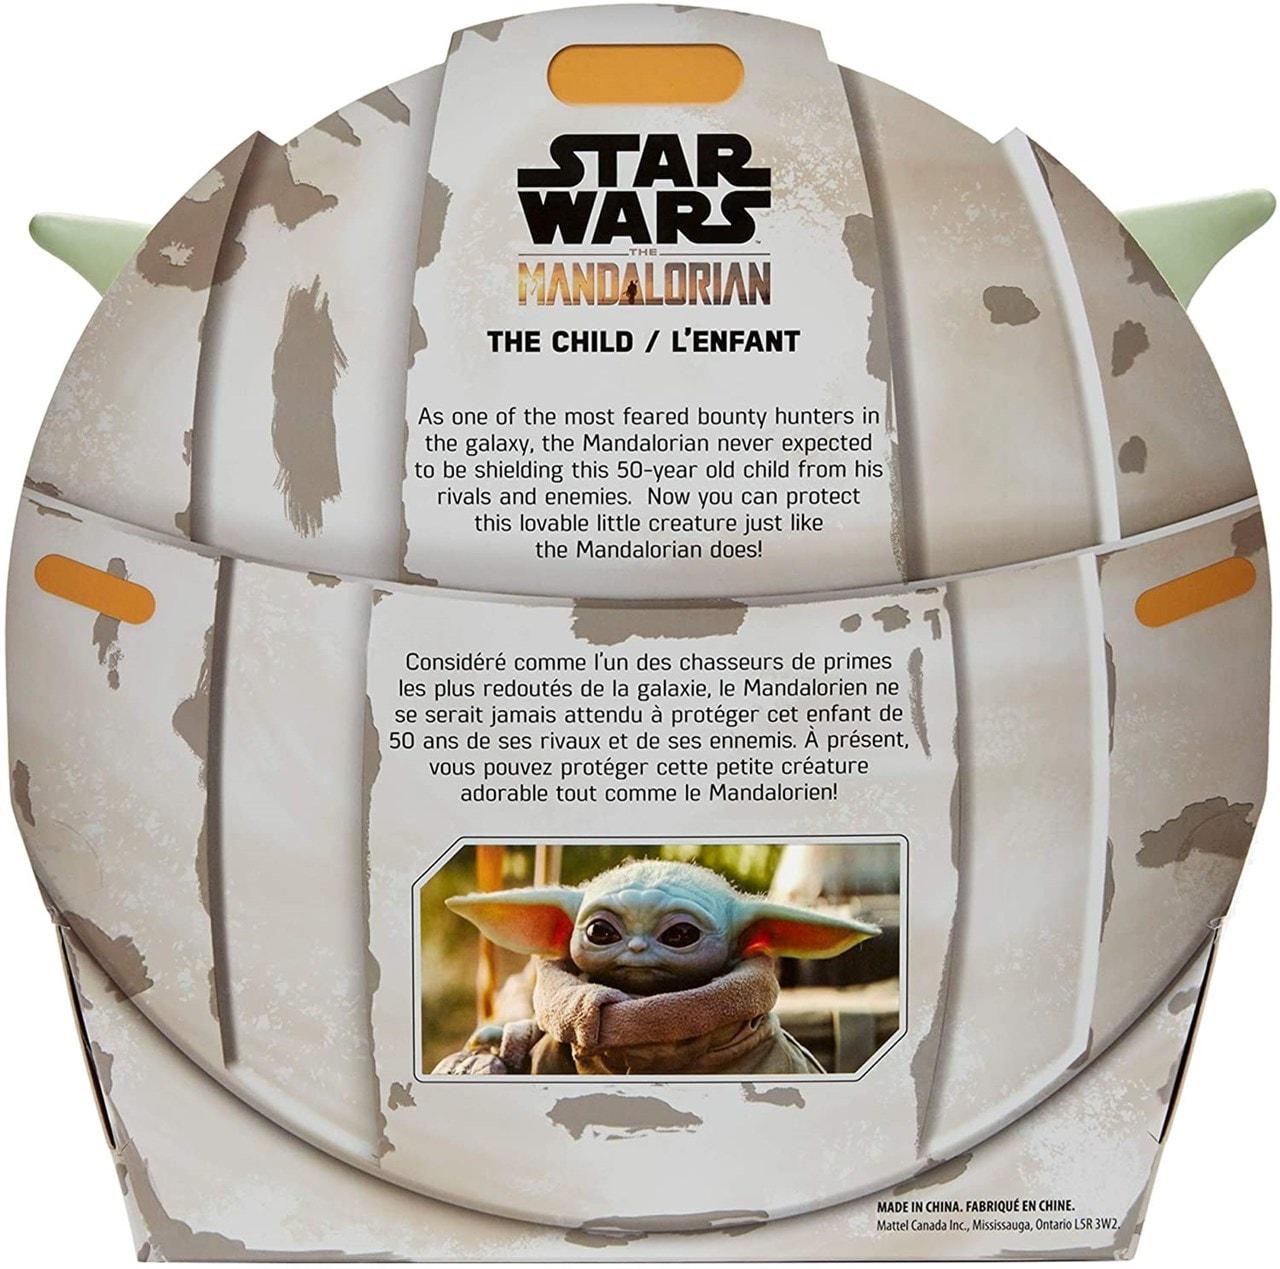 "The Mandalorian: The Child (Baby Yoda) 11"" Star Wars Plush - 5"